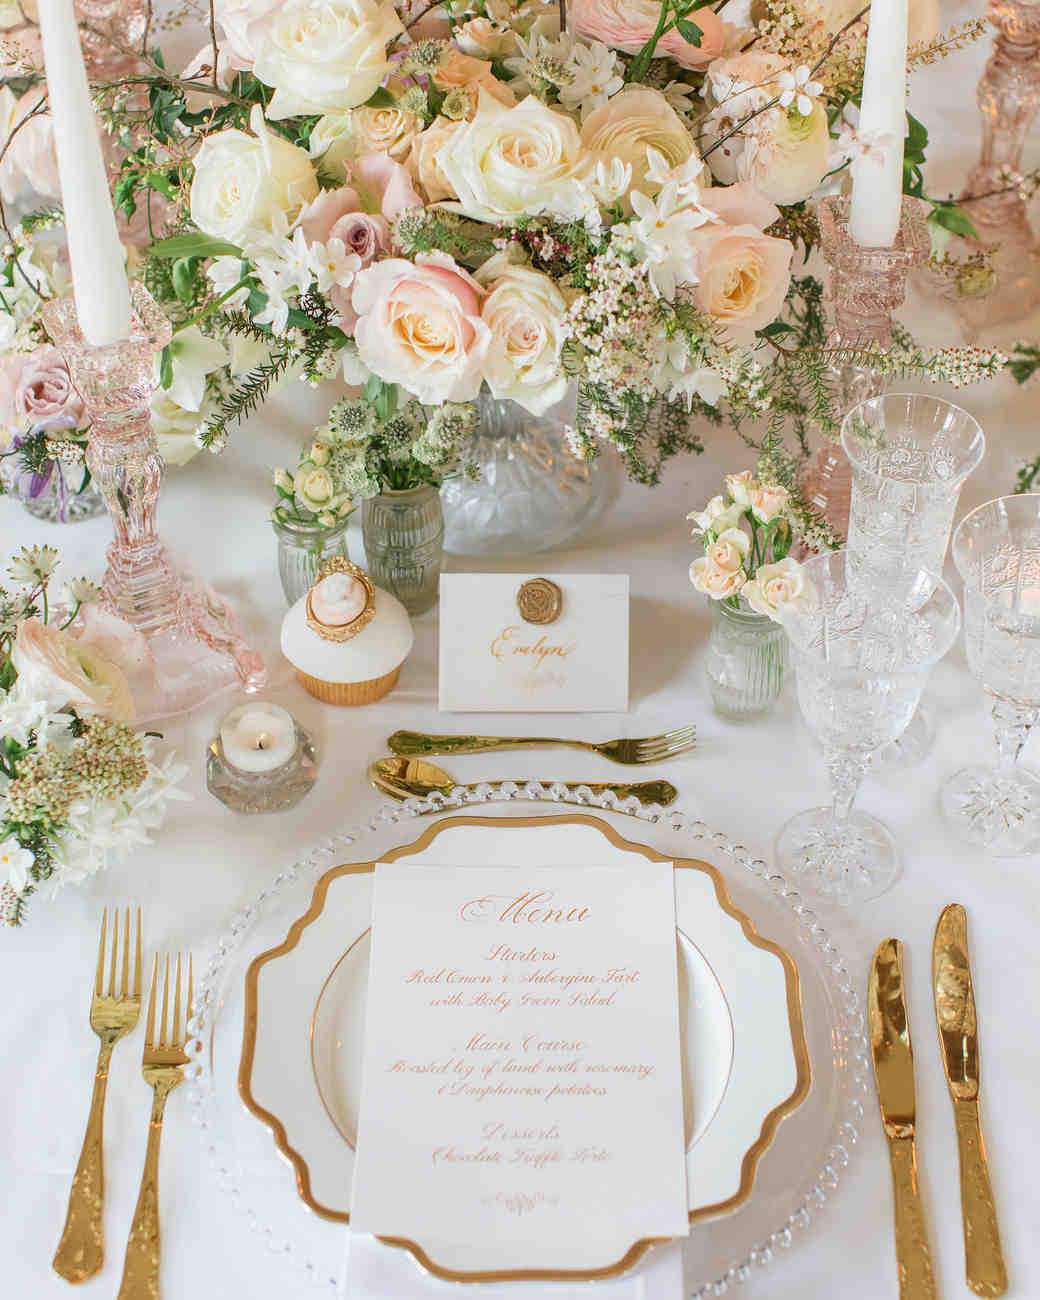 glamorous wedding ideas elevated centerpiece table setting